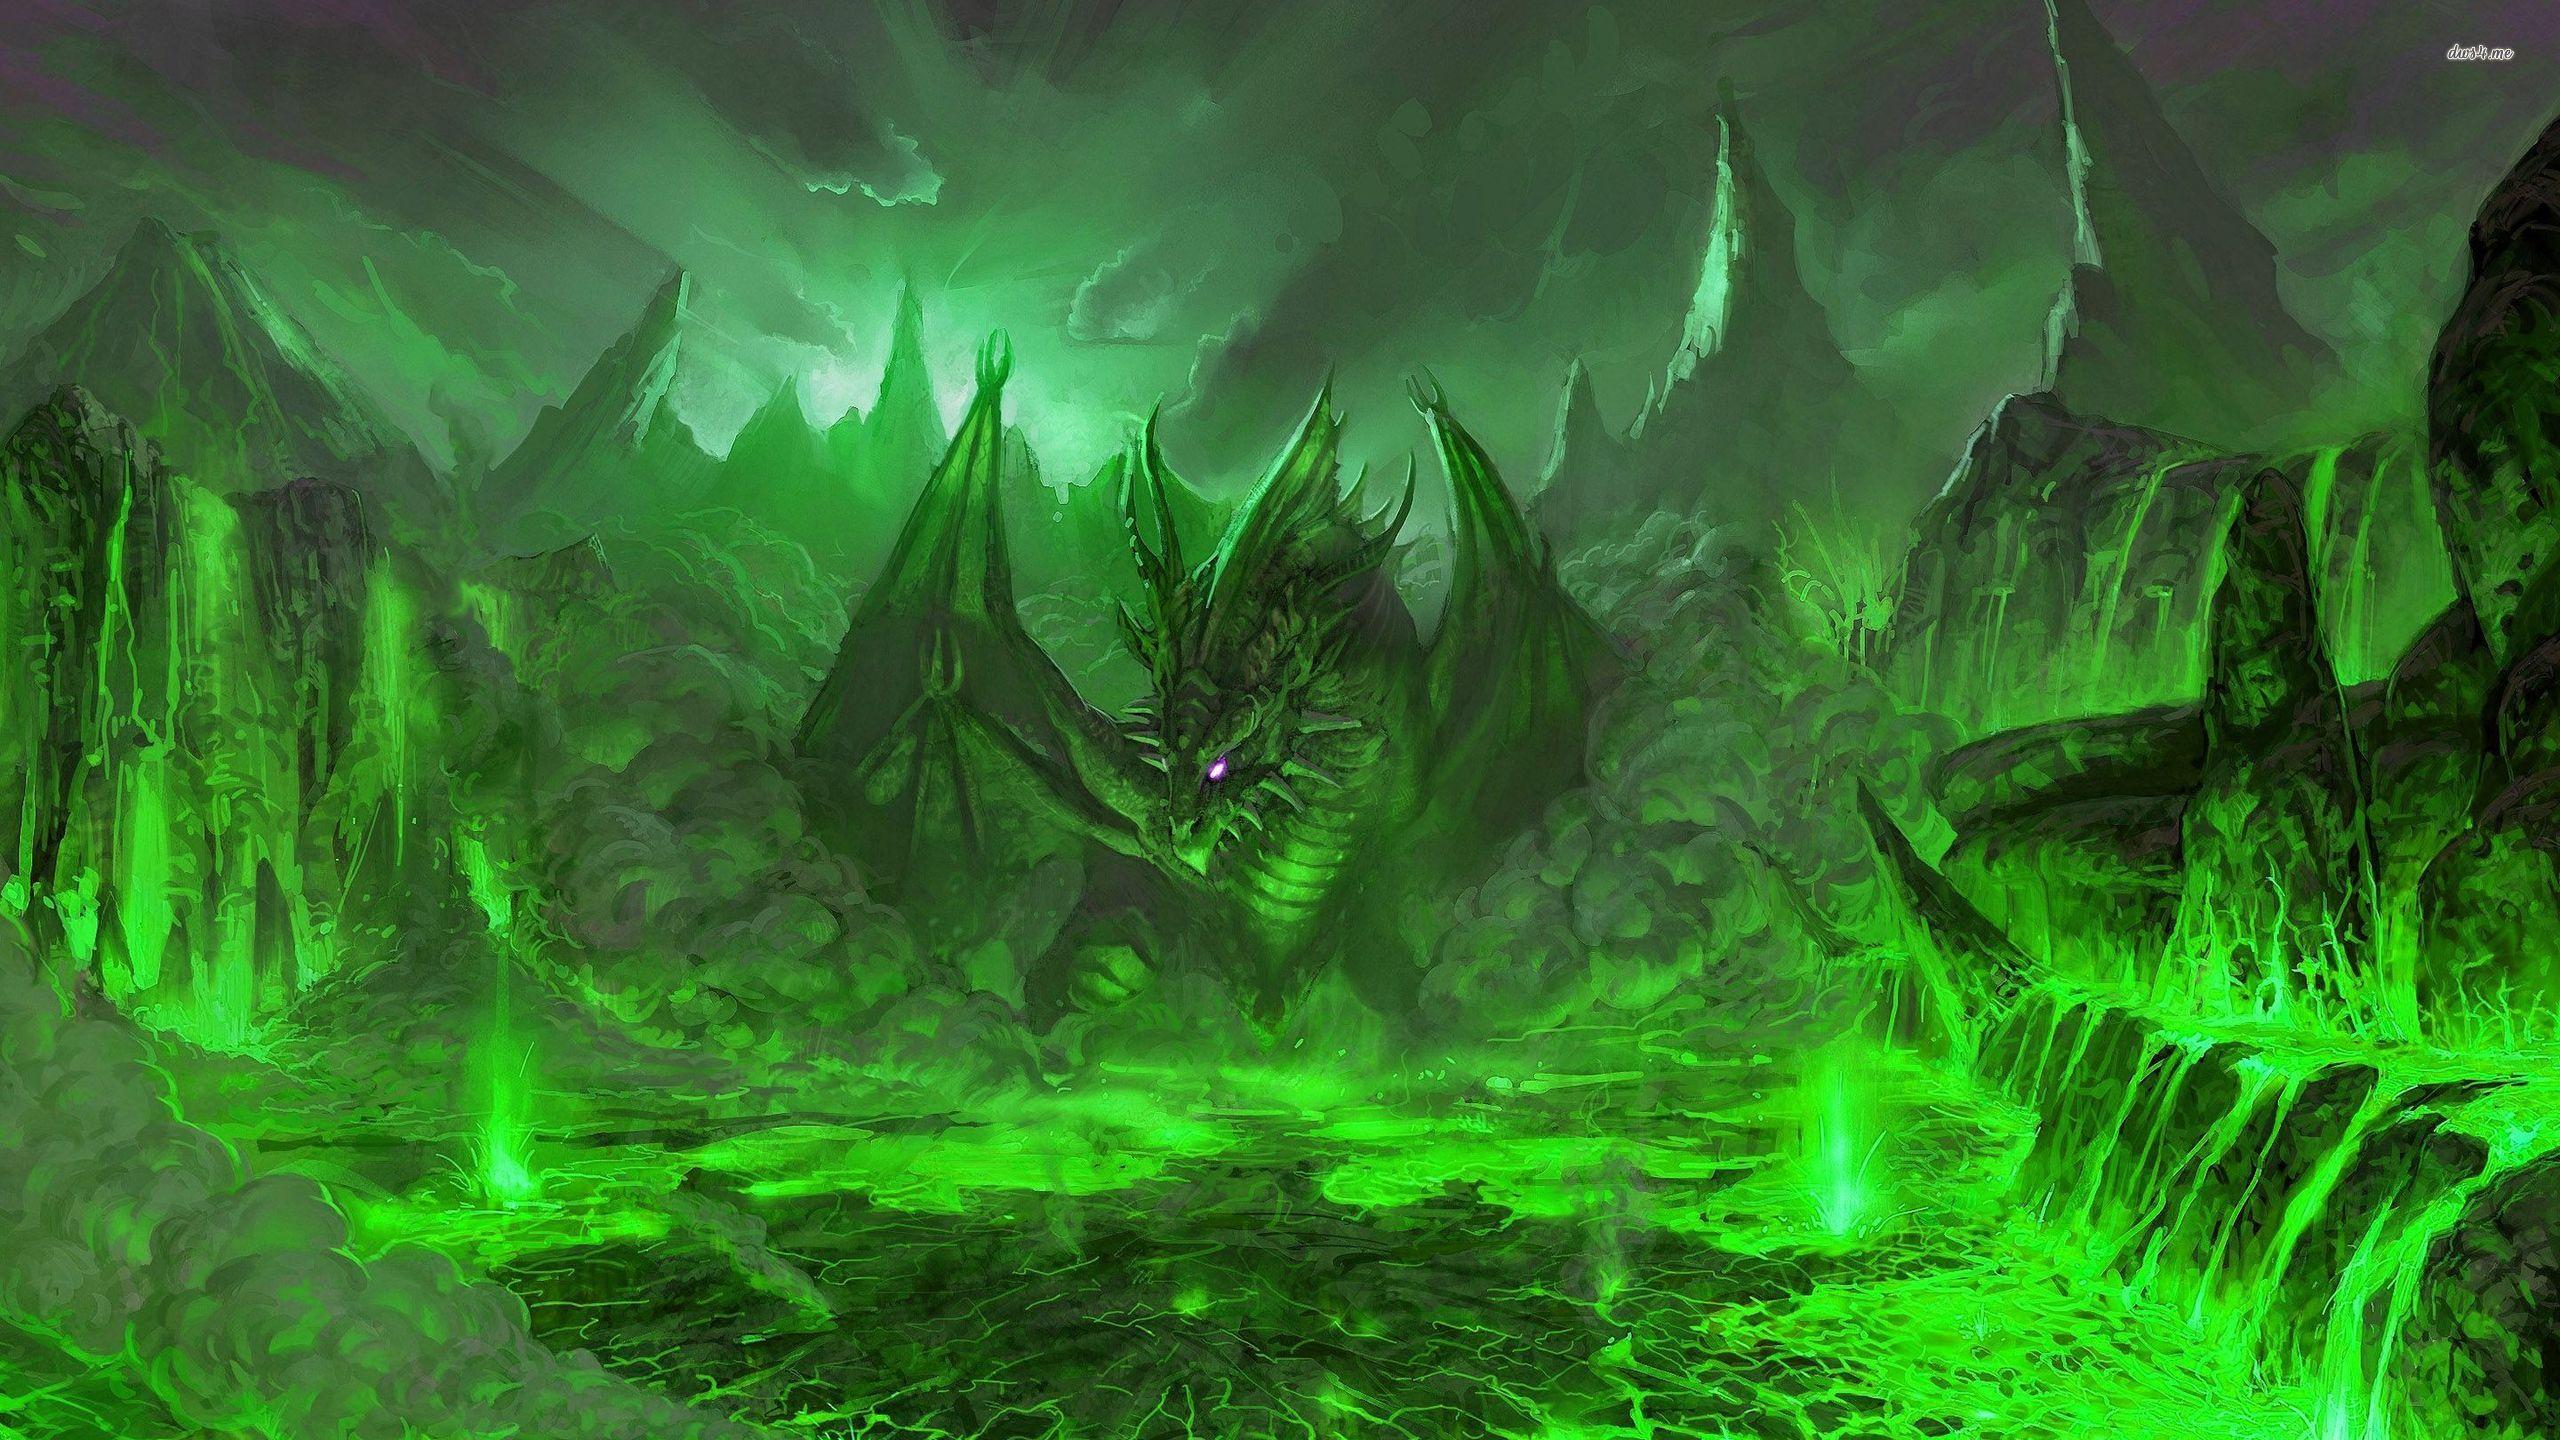 Green Dragon In The Volcano Wallpaper Green Dragon 2560x1440 Wallpaper Teahub Io